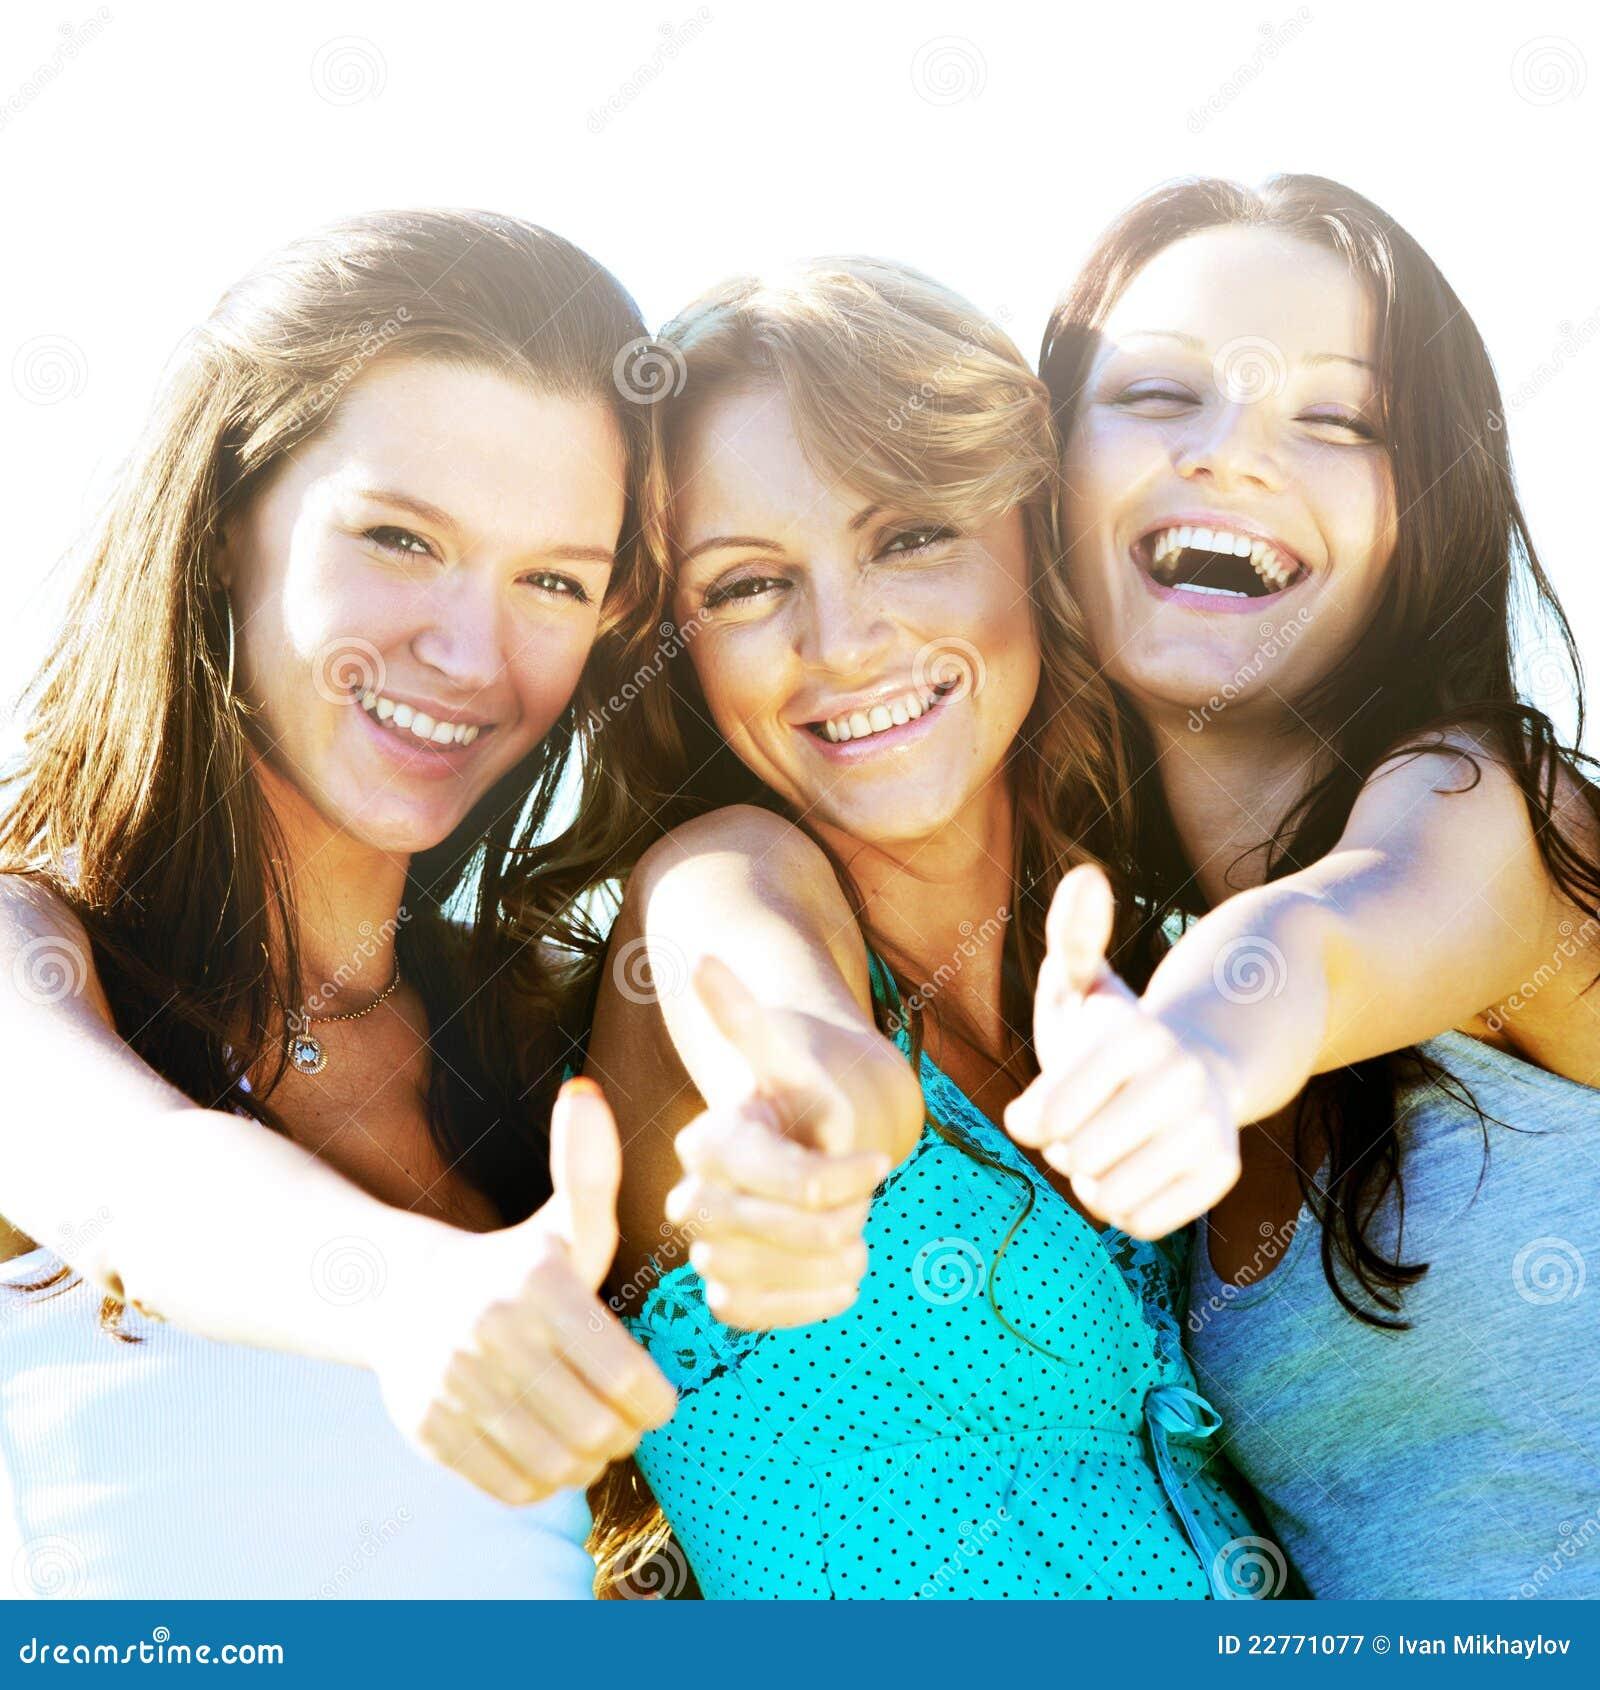 Три подружки и мужчина 1 фотография